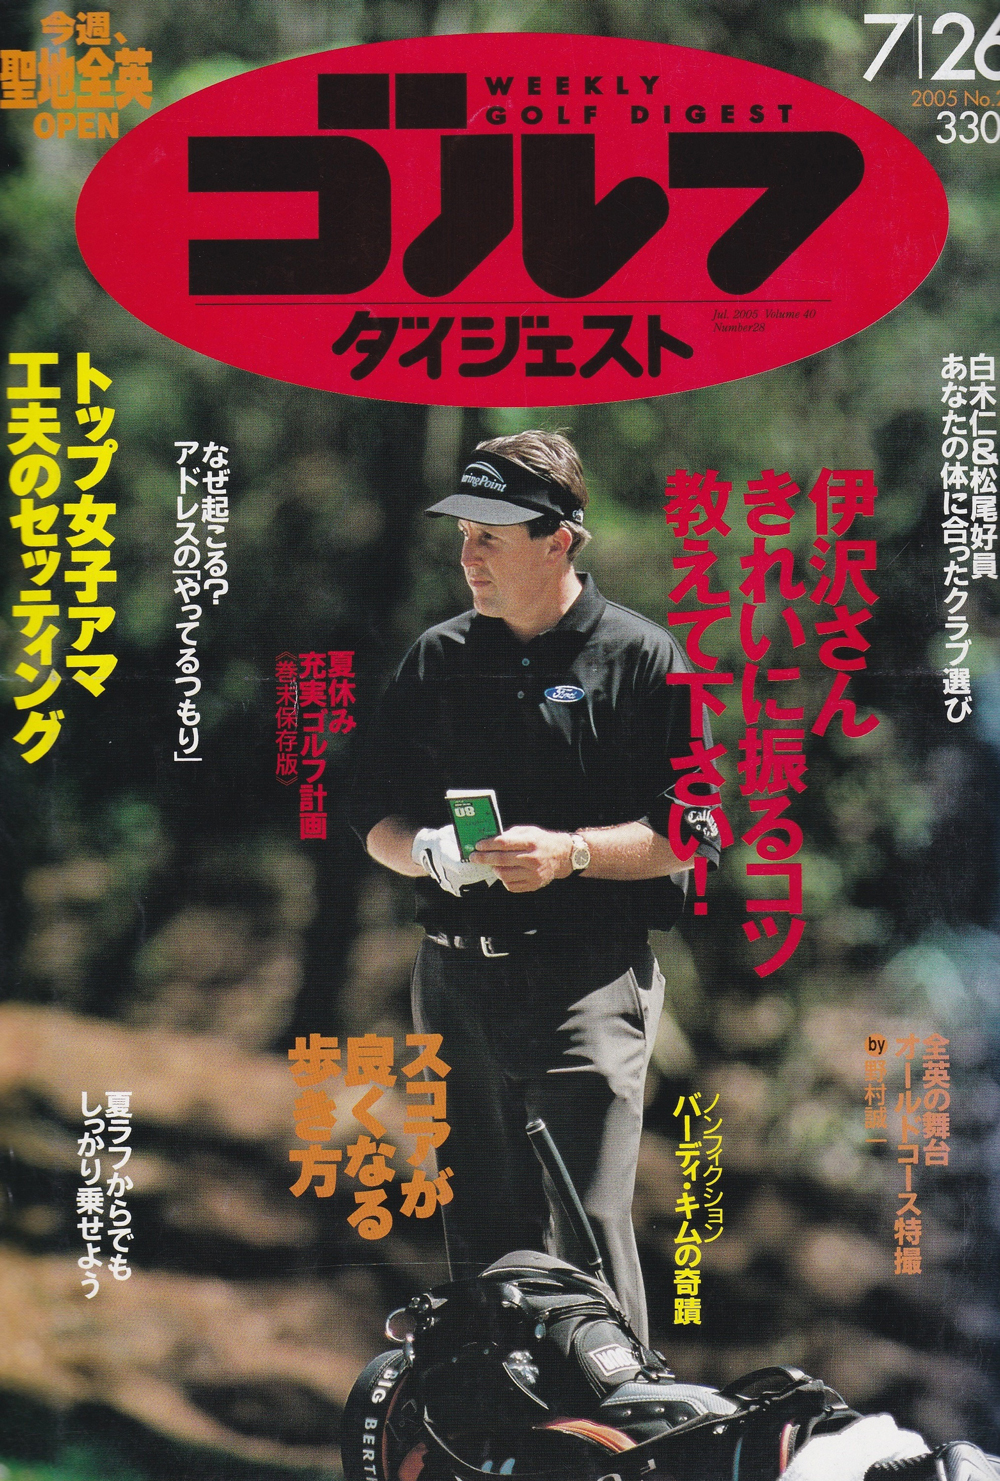 2005.7 GOLF DIGEST Top Amateur Setting